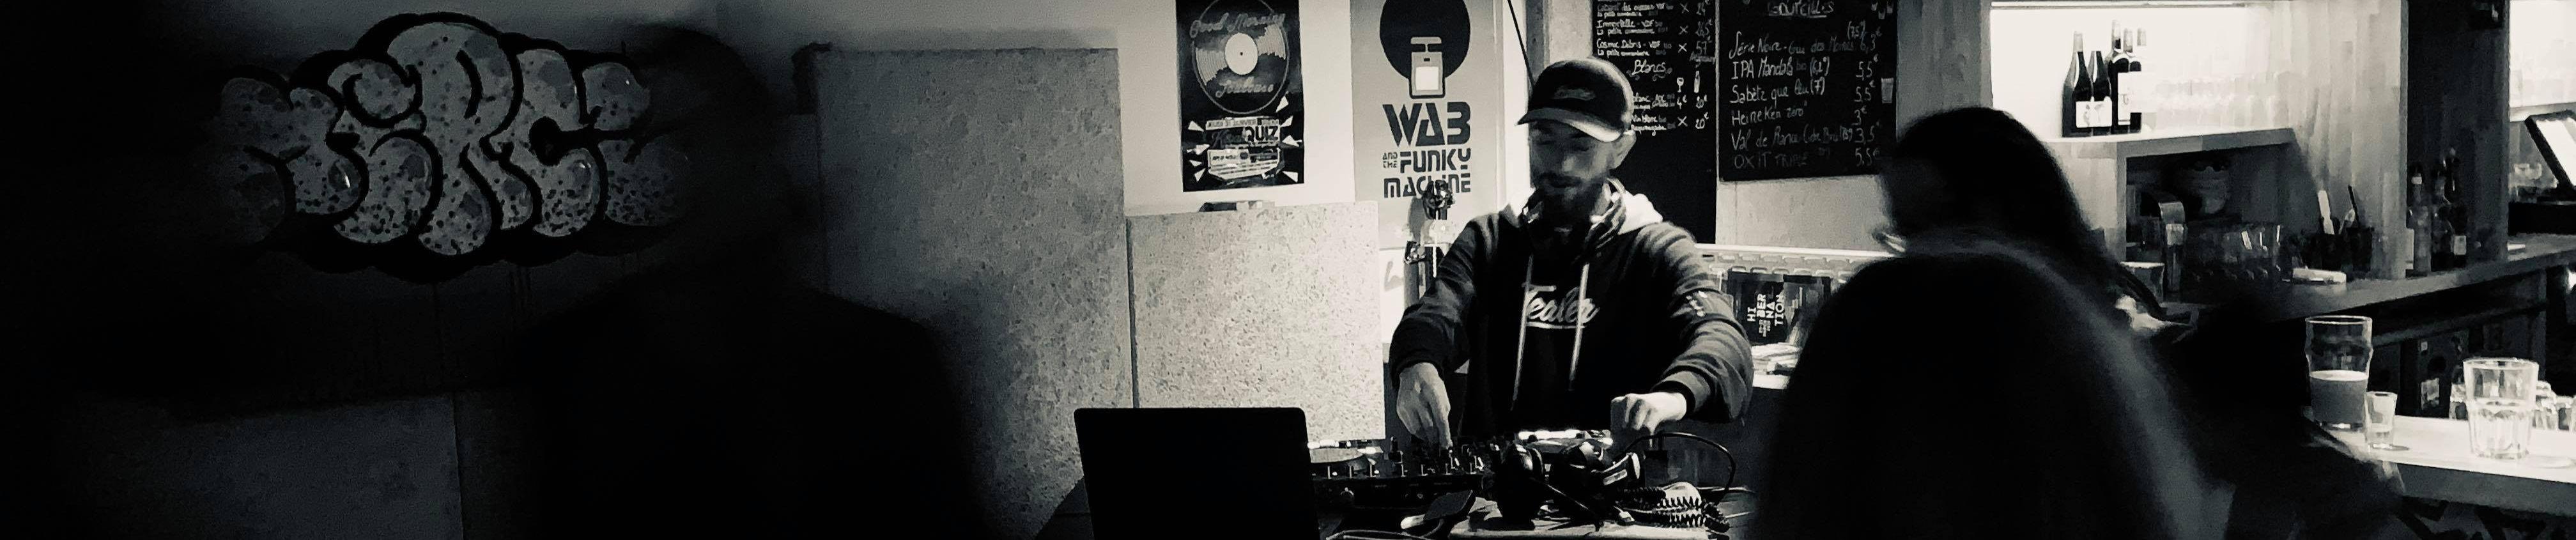 Chub | Free Listening on SoundCloud